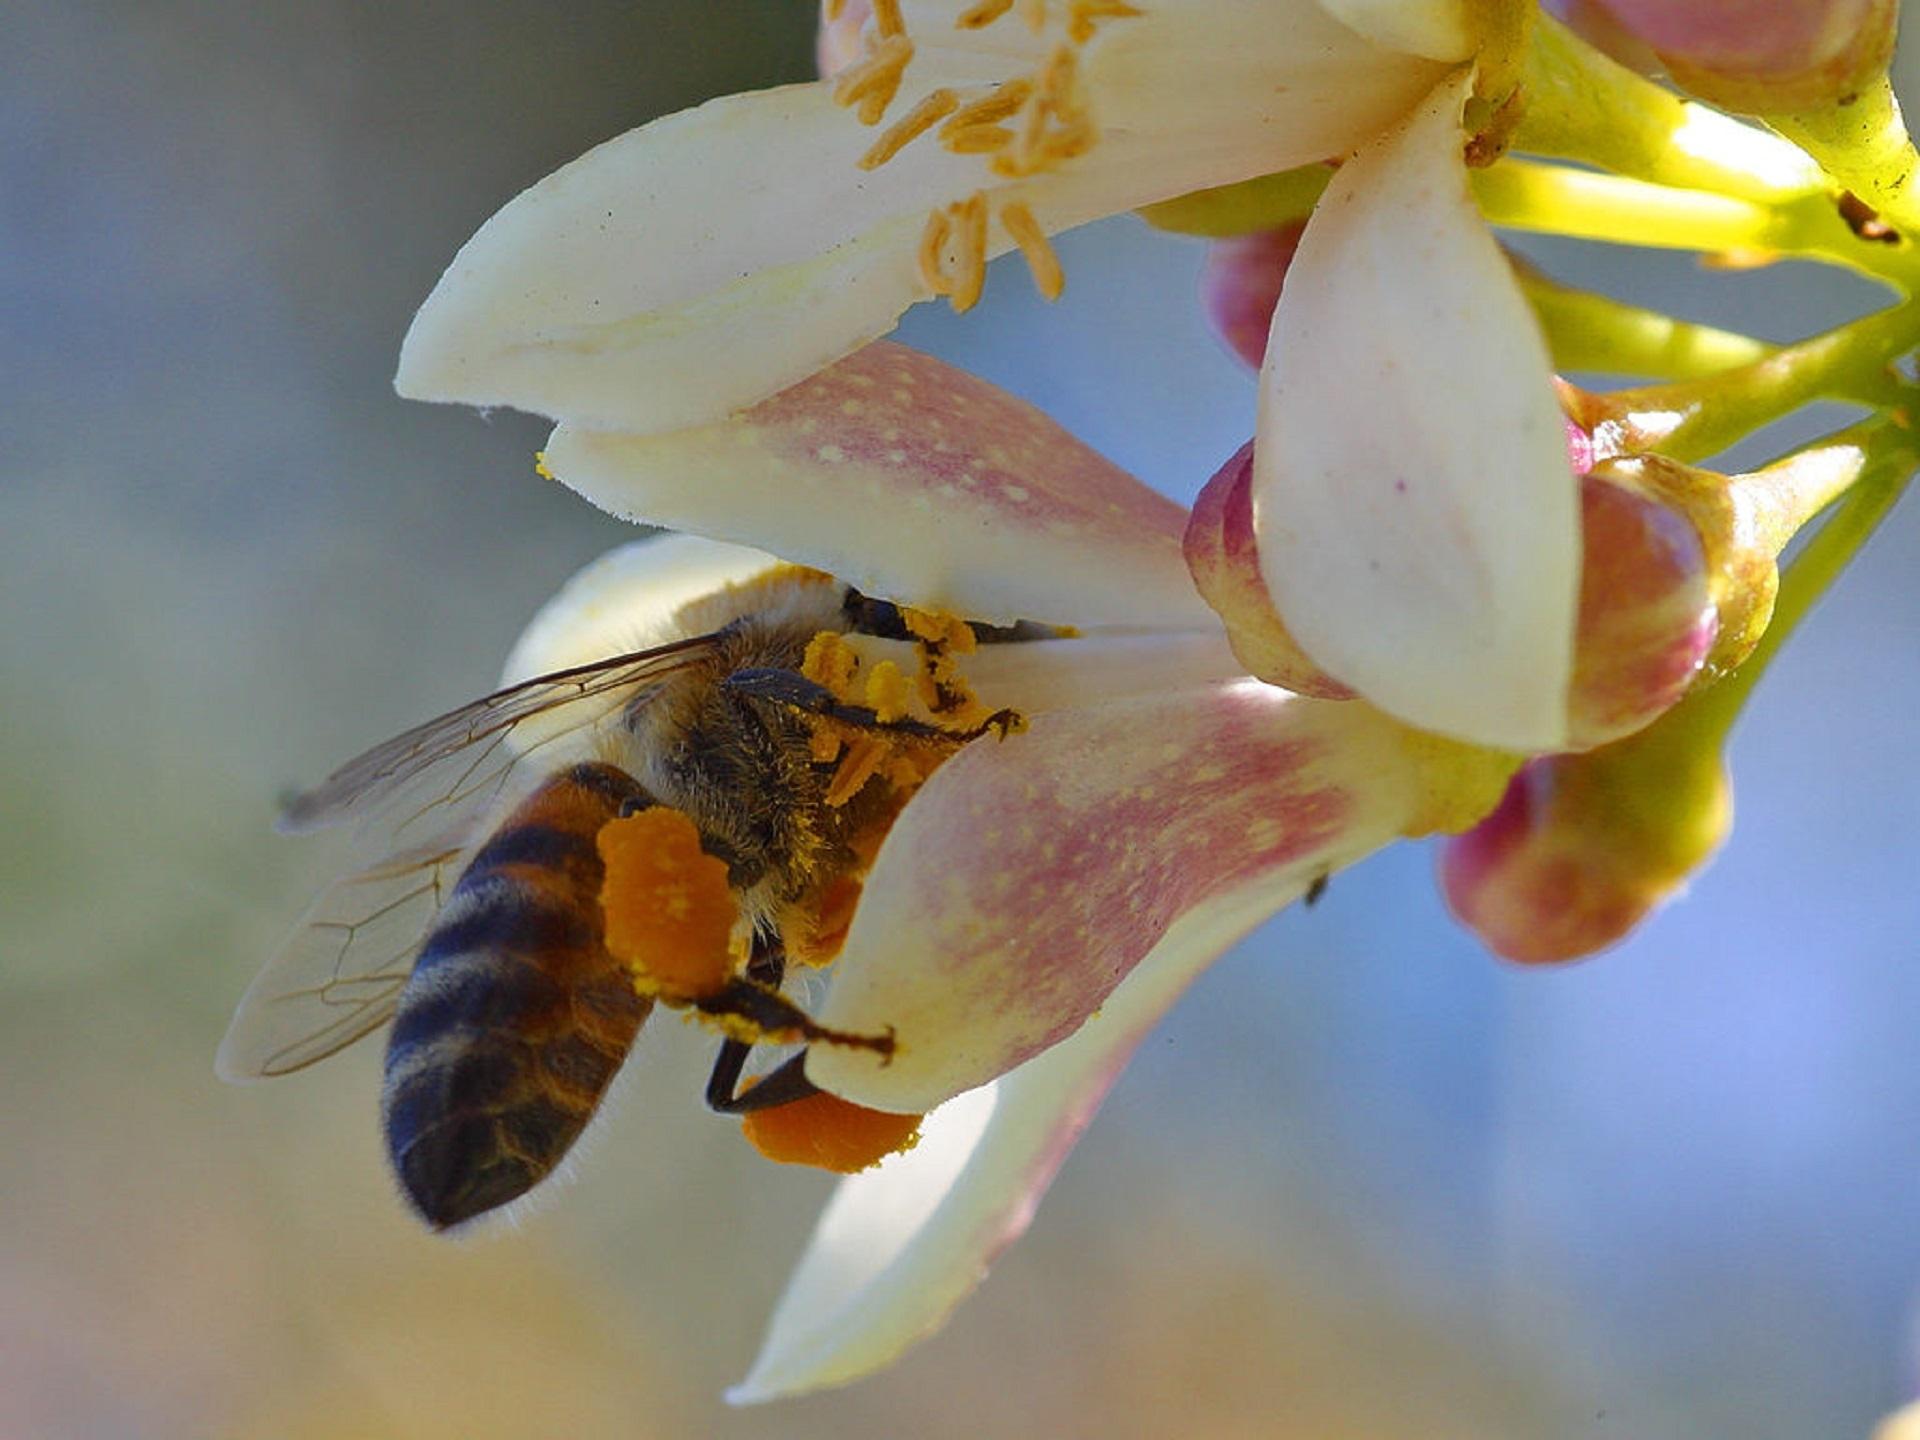 albine laptisor - sfatulparintilor.ro - pixabay_com